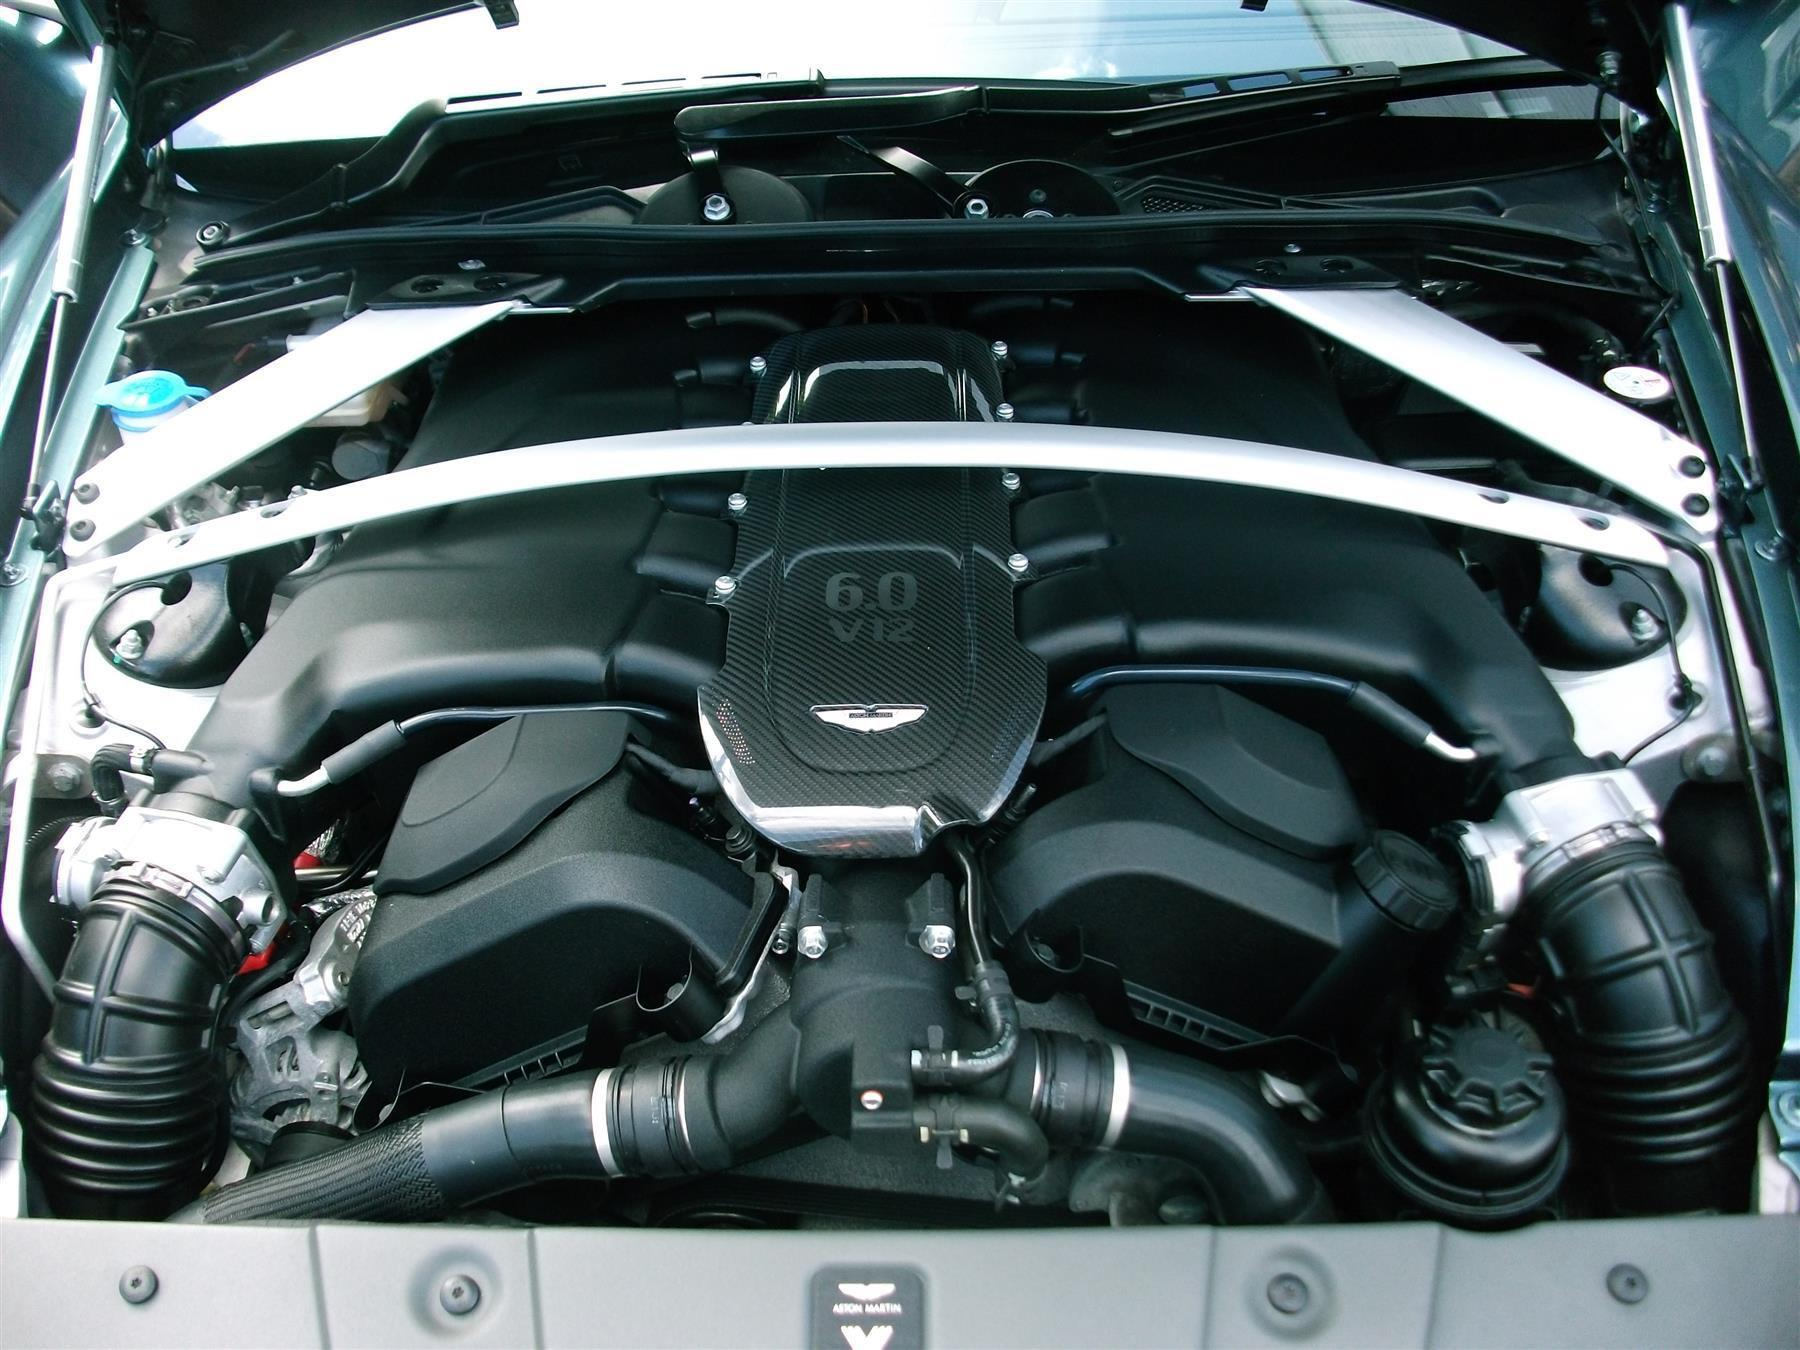 Aston_Martin_V12_Vantage_V600_Roadster_sale-0008